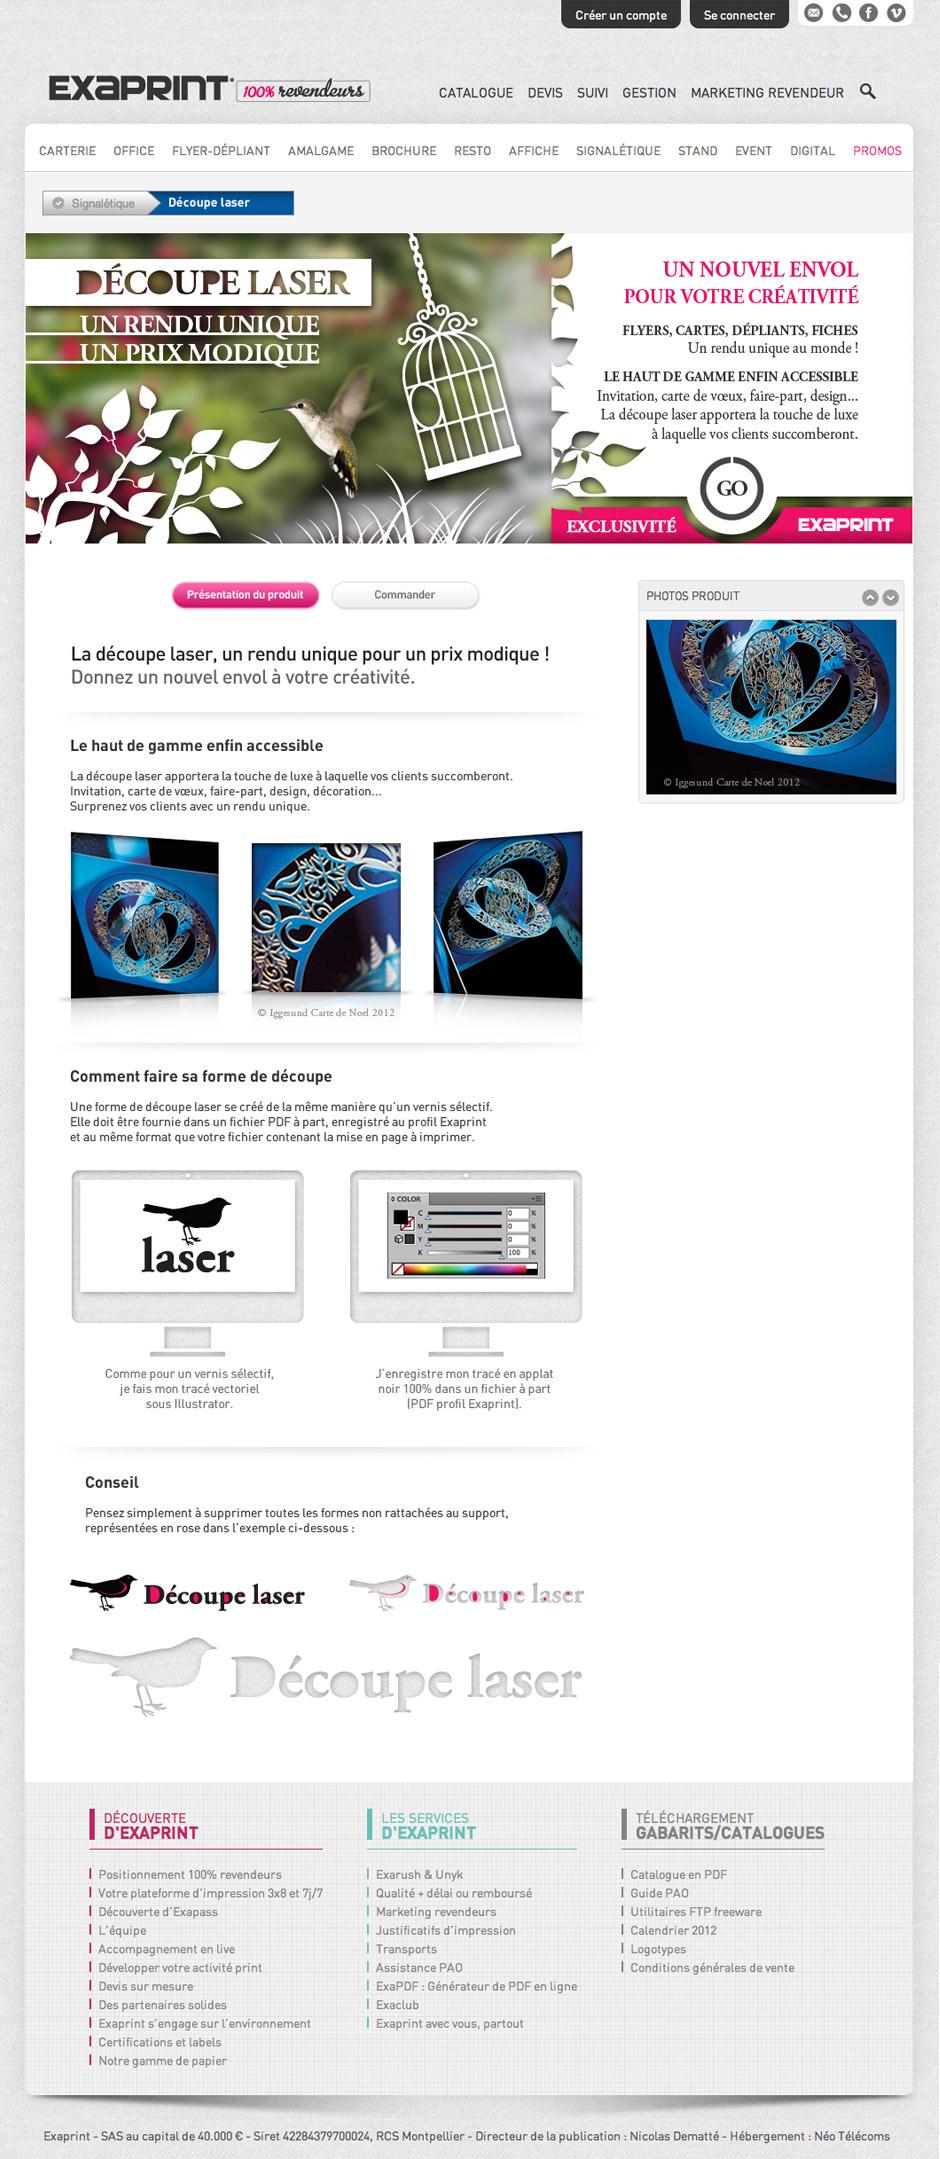 graphiste-montpellier-creation-exaprint-decoupe-laser-agence-communication-montpellier-caconcept-alexis-cretin-3